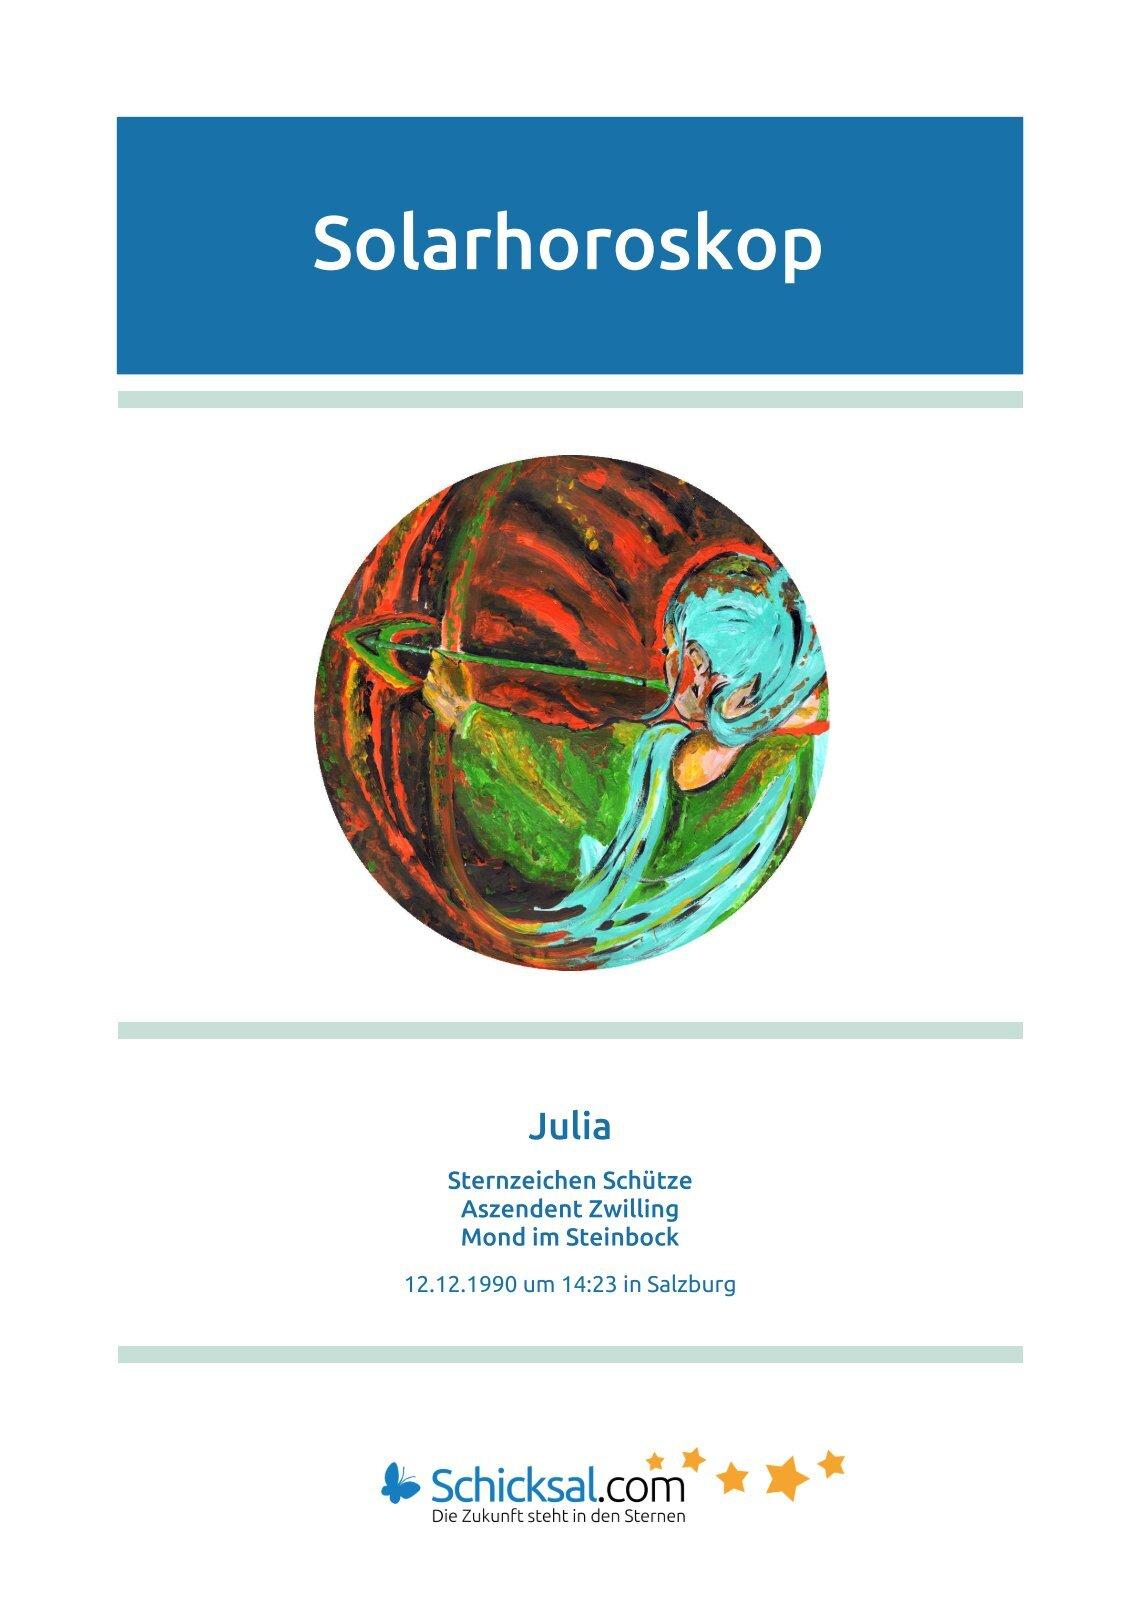 Schütze - Solarhoroskop